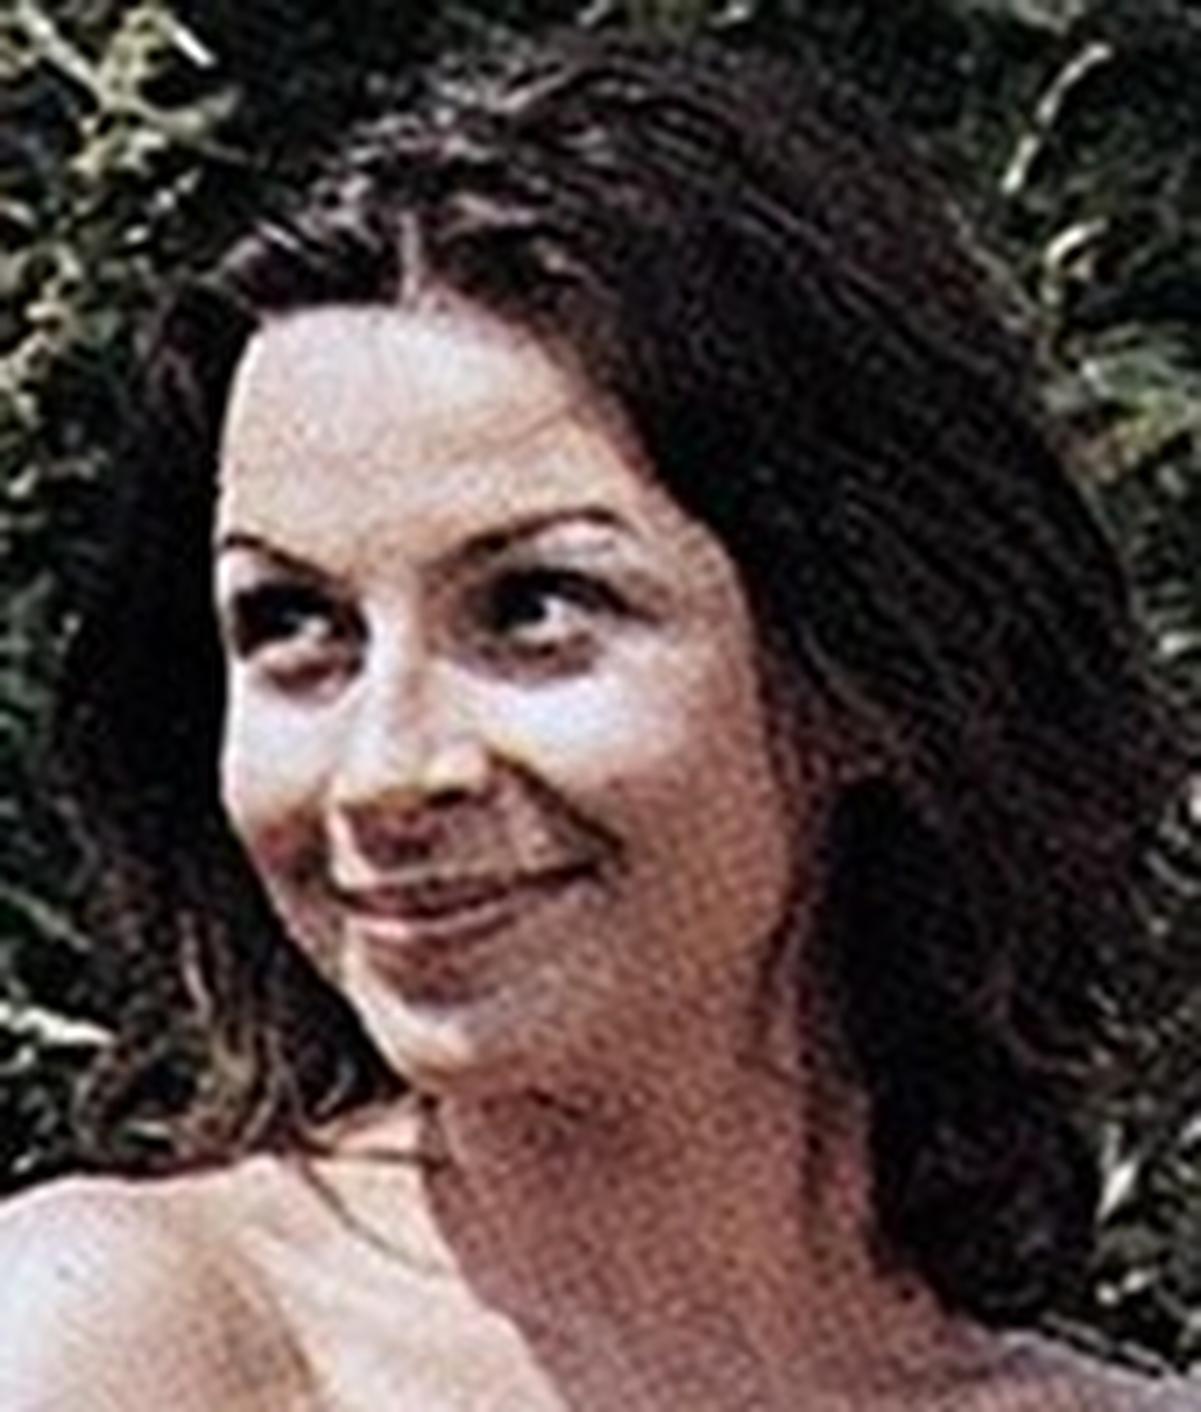 Natascha Verell